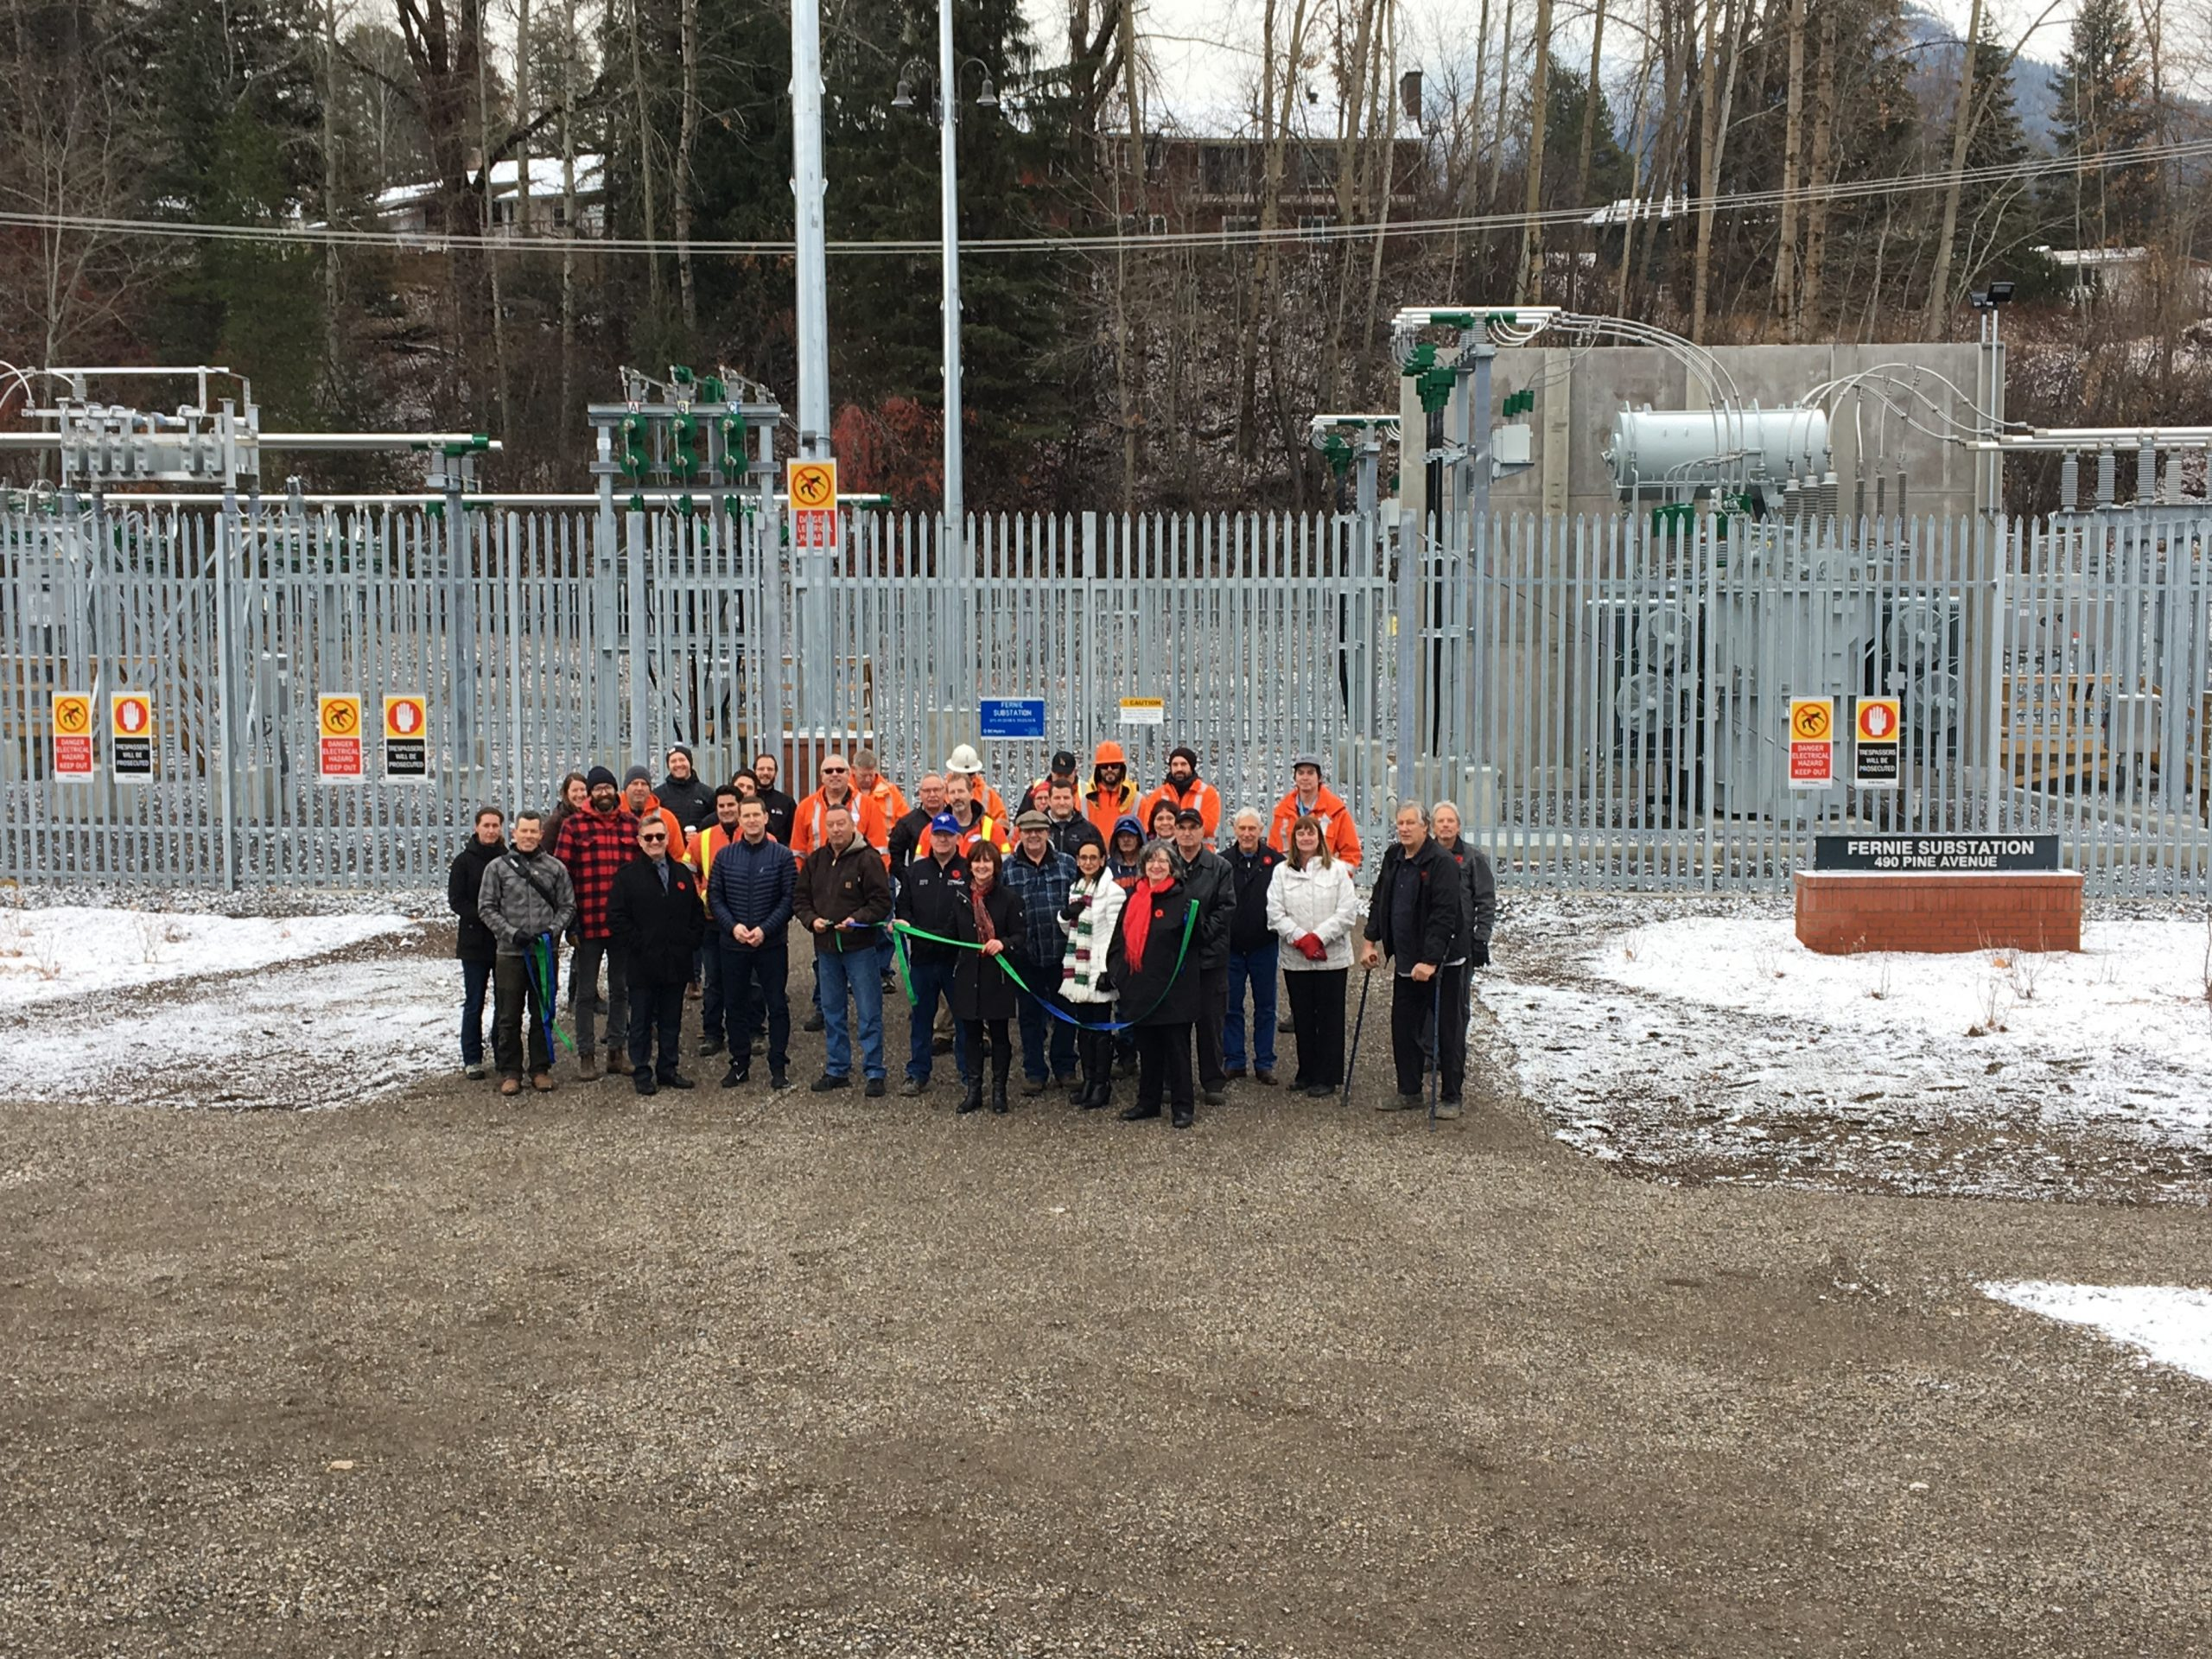 BC Hydro celebrates completion of Fernie Substation Upgrades